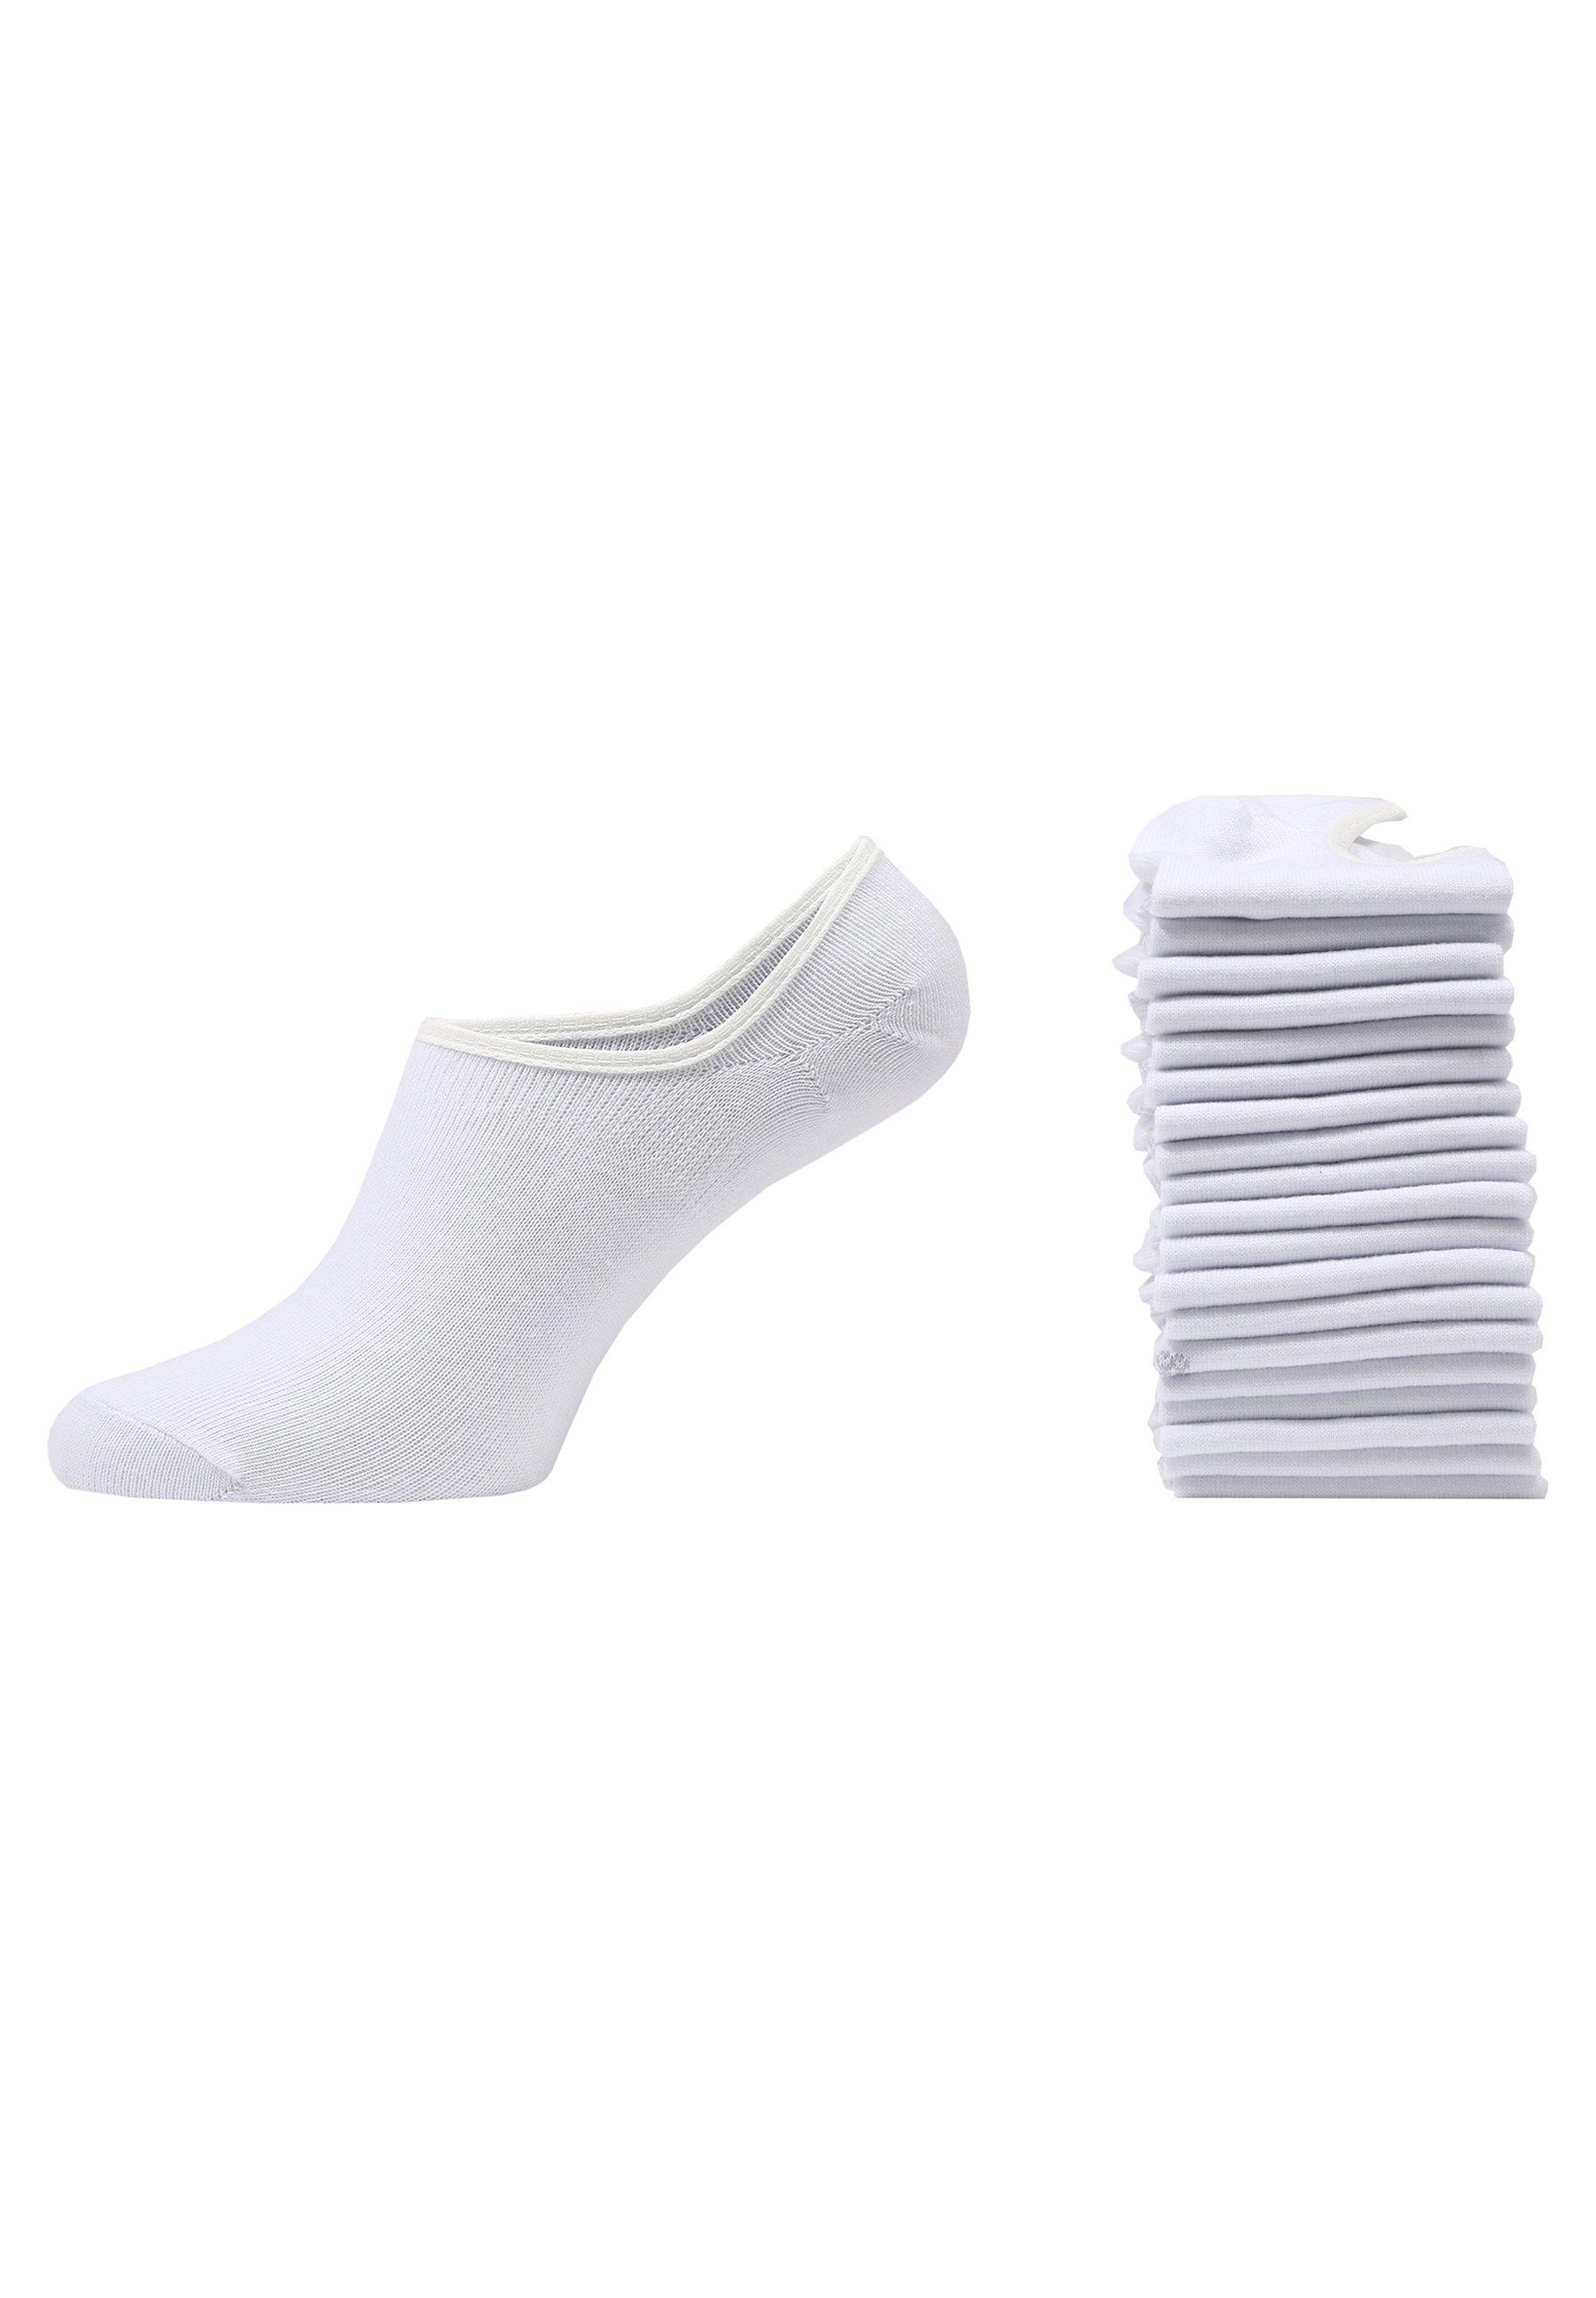 Femme 10ER PACK - Socquettes